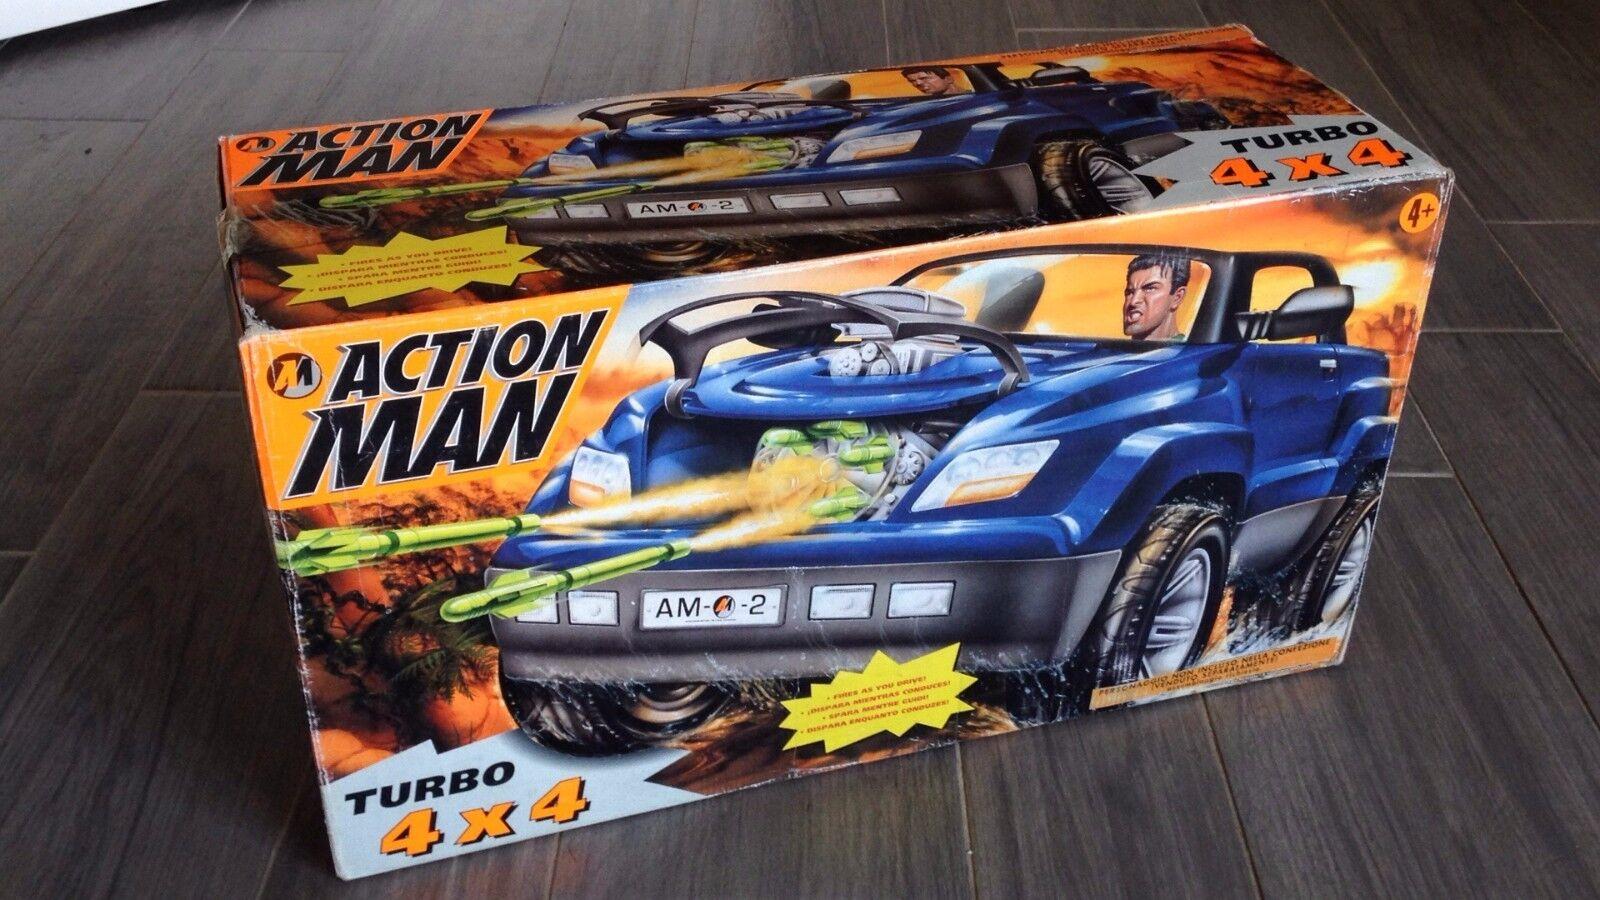 HASBRO GIG ACTION MAN mission TURBO 4x4 4 x 4 new jeep fuoristrada suv SEALED